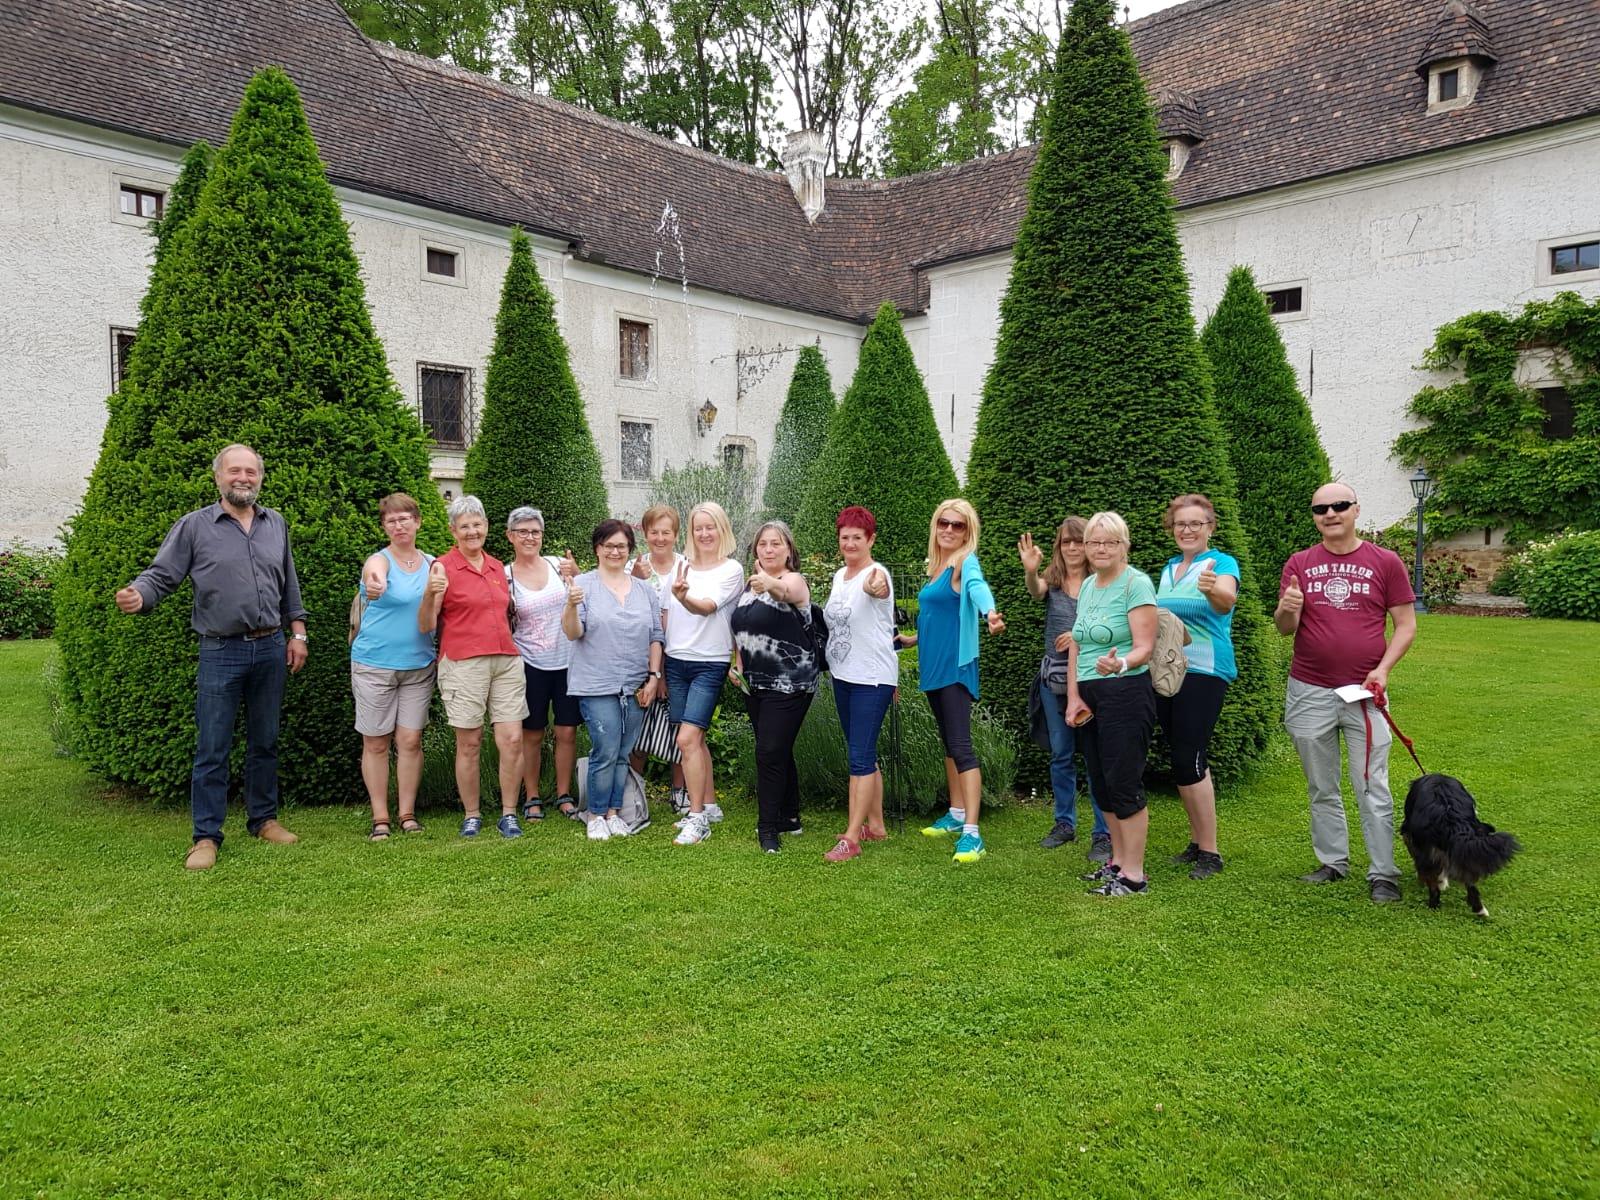 Wanderung Gruppenfoto